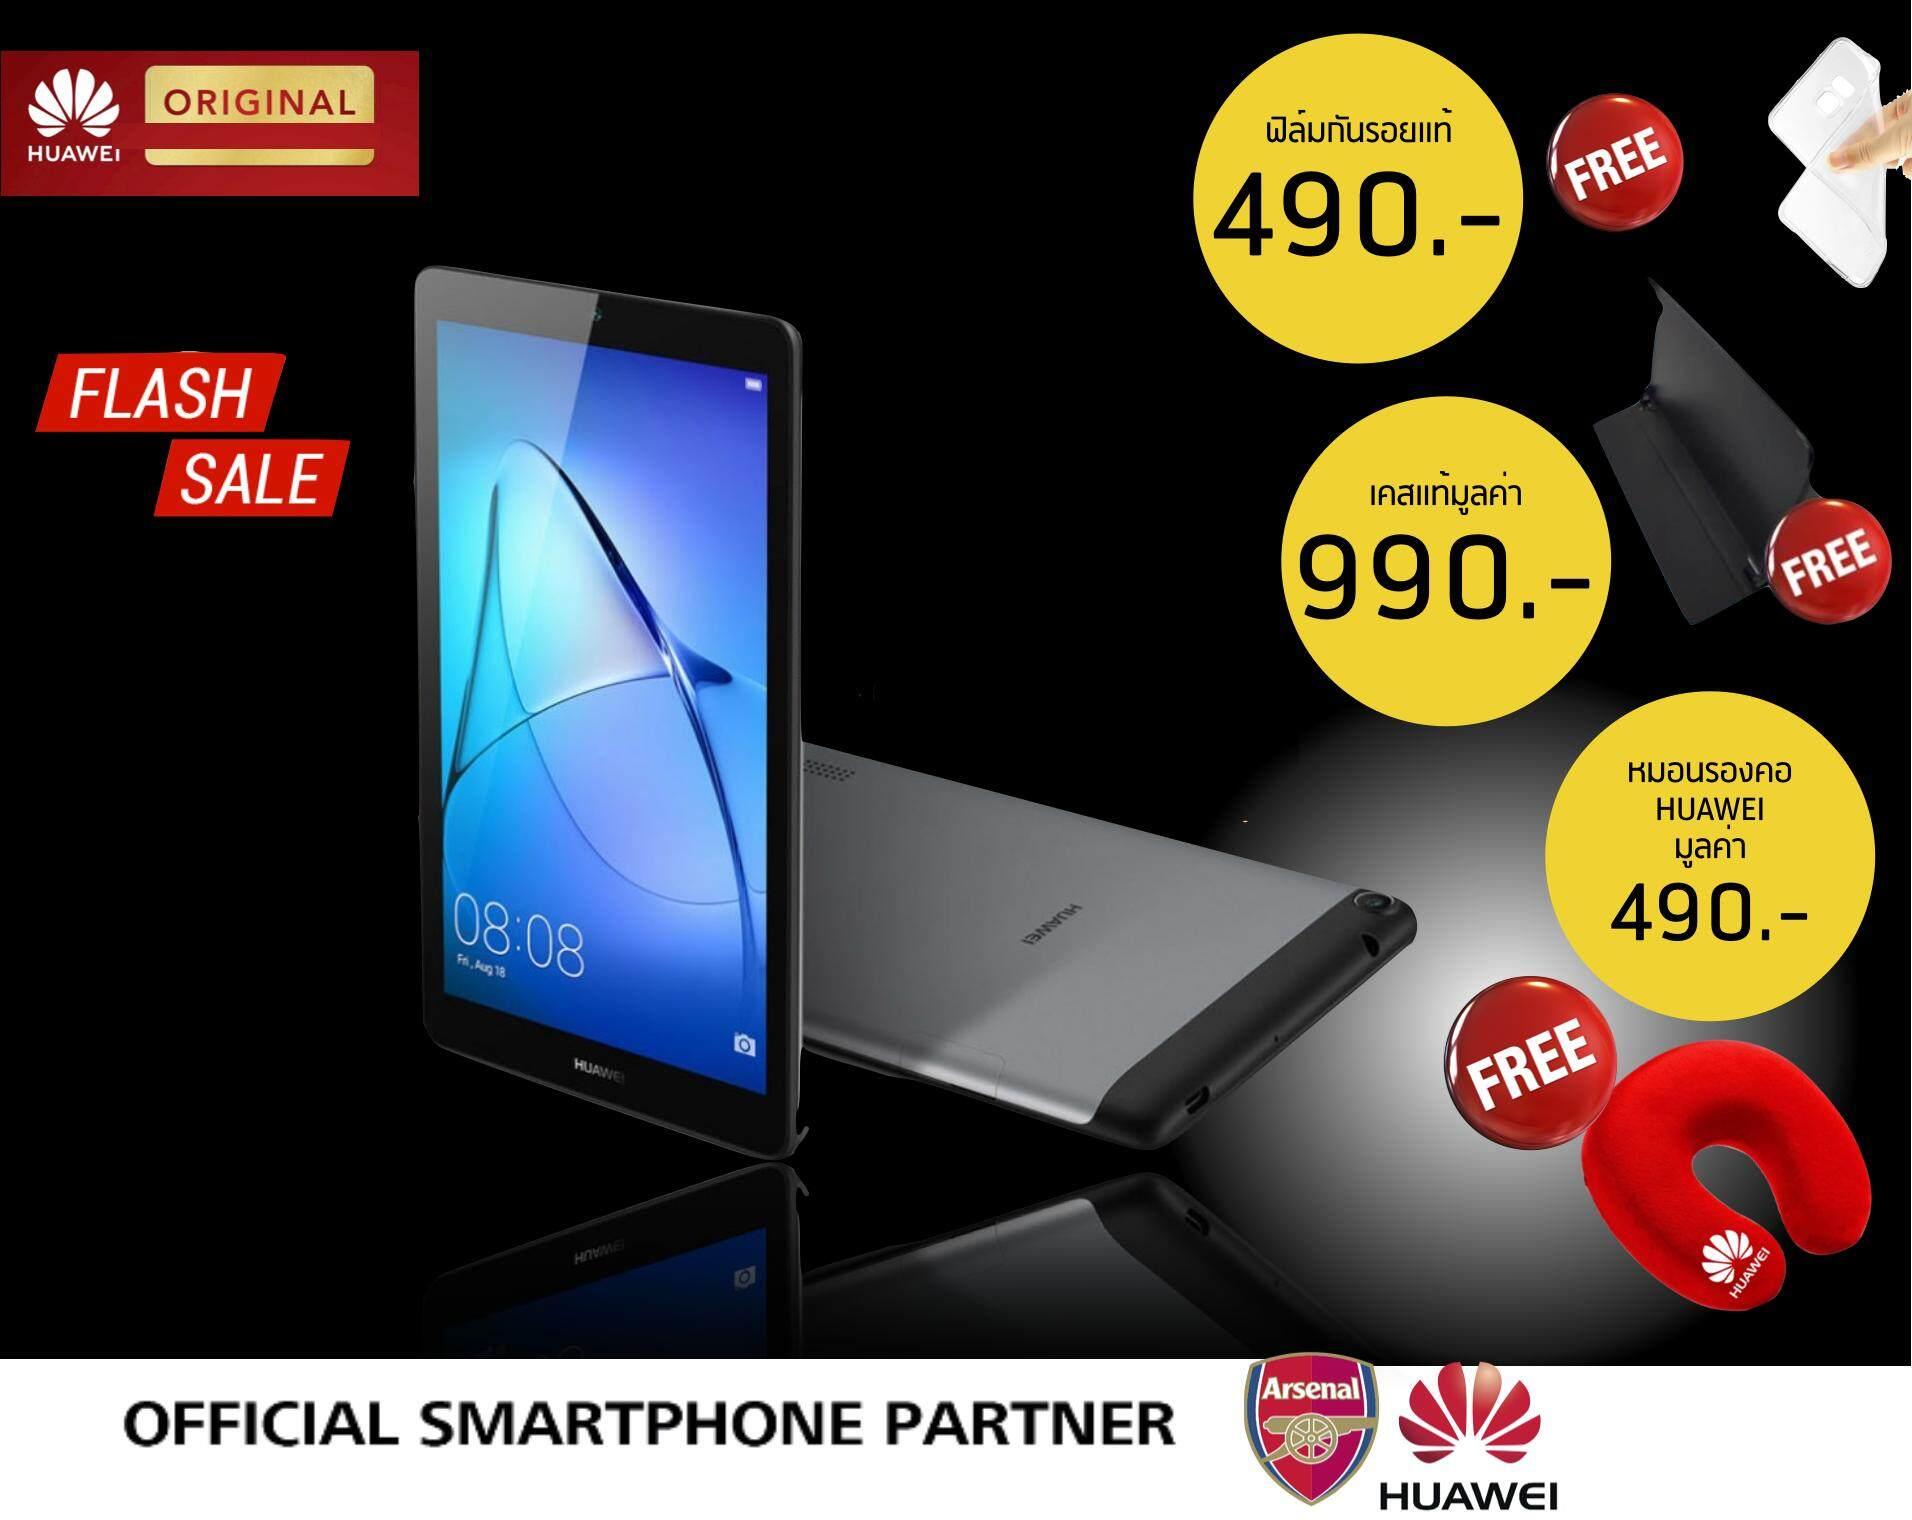 [HUAWEI ORIGINAL] Huawei media pad T3 แท้ศูนย์ รับฟรีเคสแท้ มูลค่า 990 บาท+ฟิล์มแท้+หมอนรองคอ Huawei มูลค่า 490